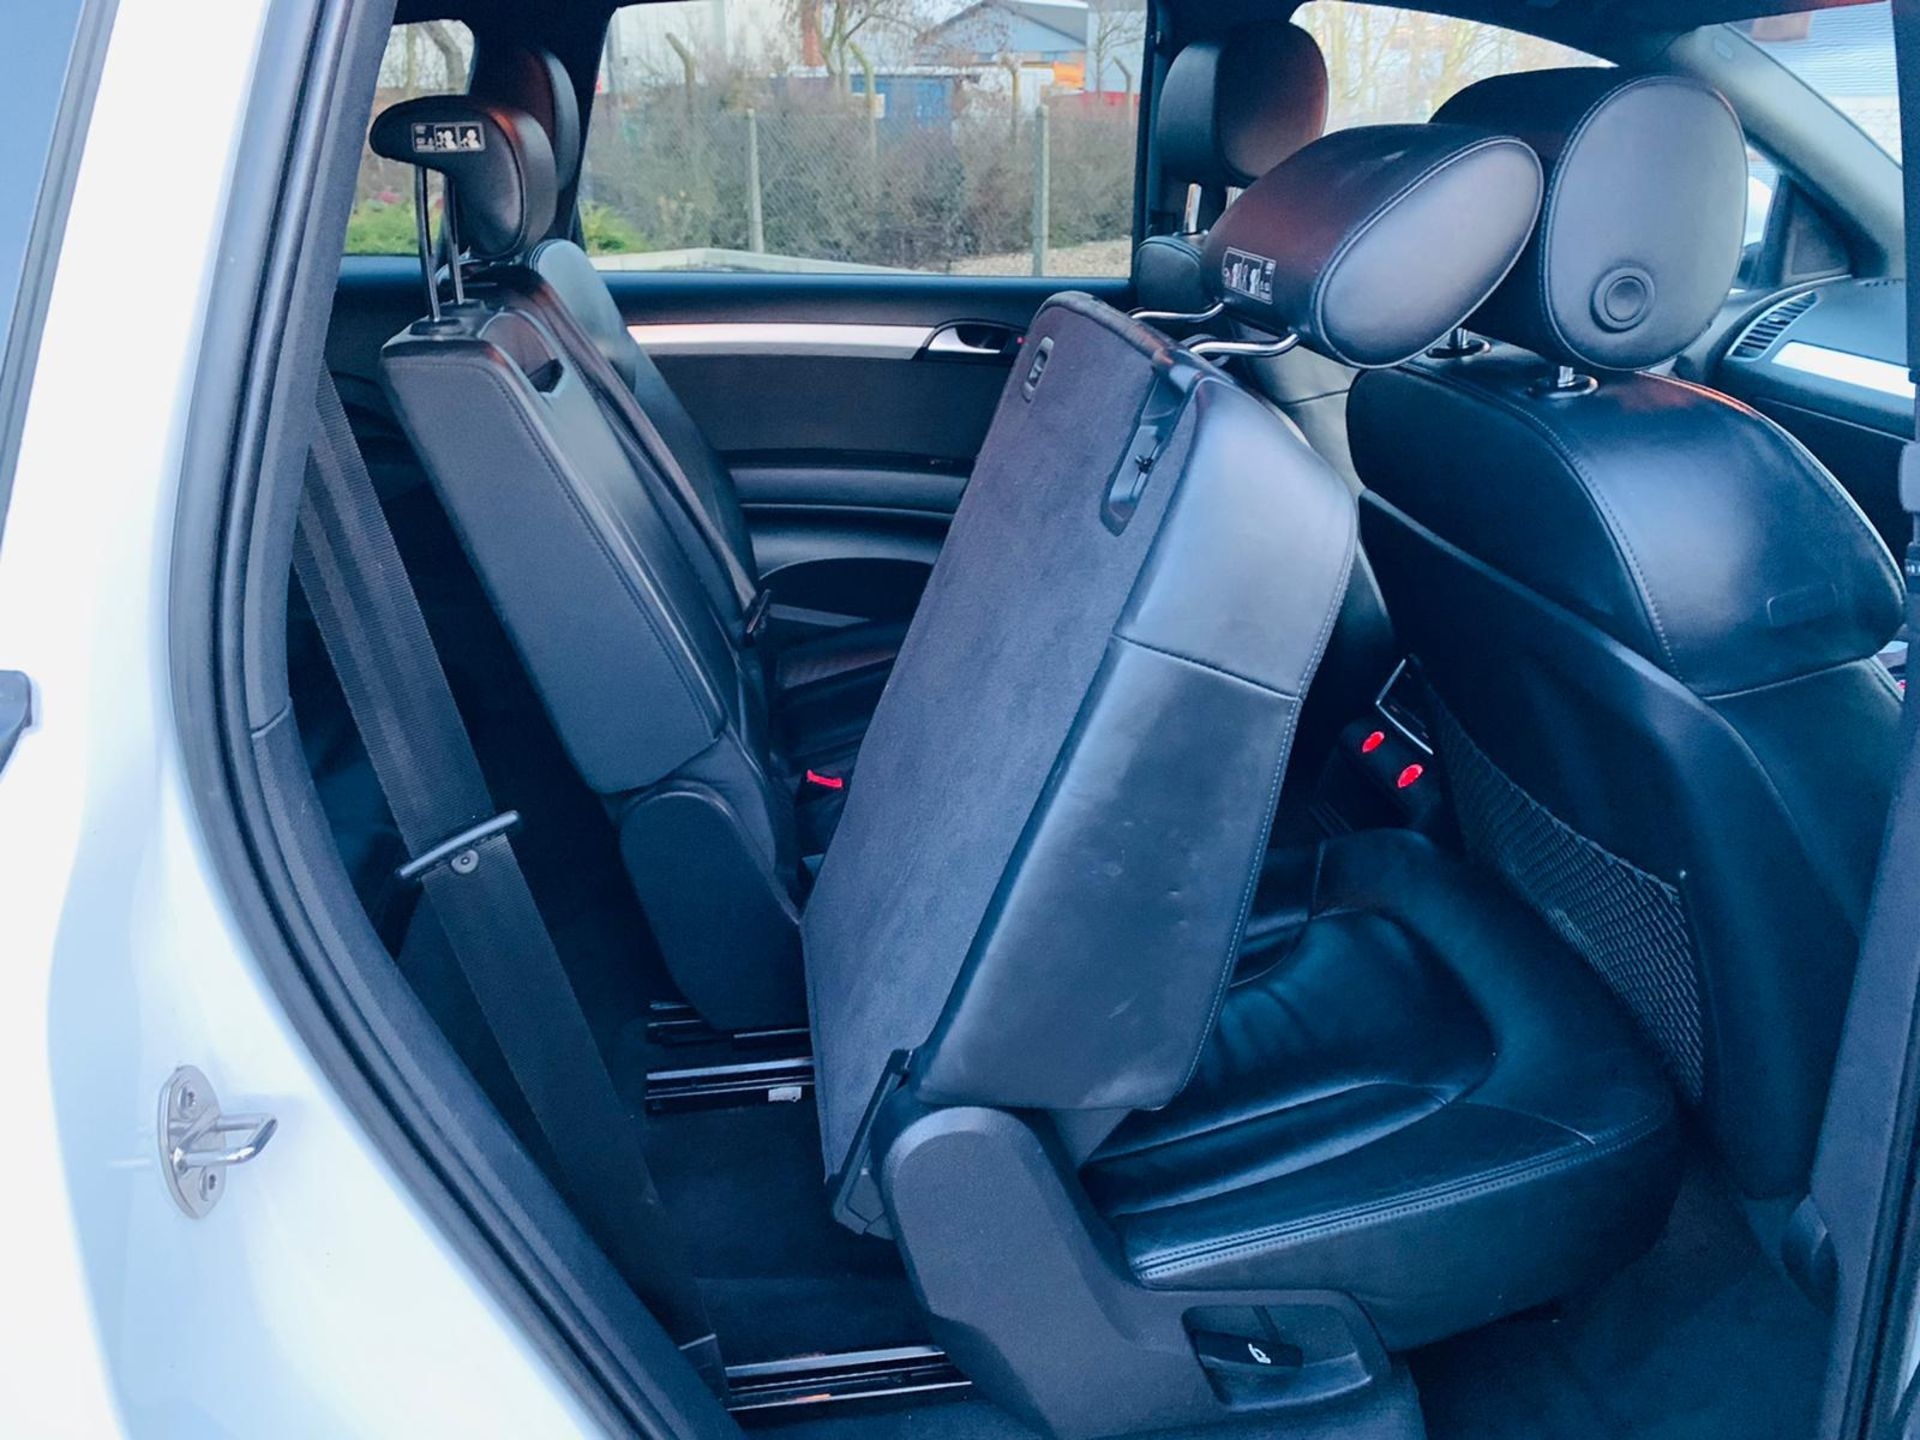 (Reserve Met)Audi Q7 3.0 TDI Quattro S Line Plus Auto (7 Seats) - 12 Reg - Only 63k Miles -Sat Nav- - Image 15 of 37